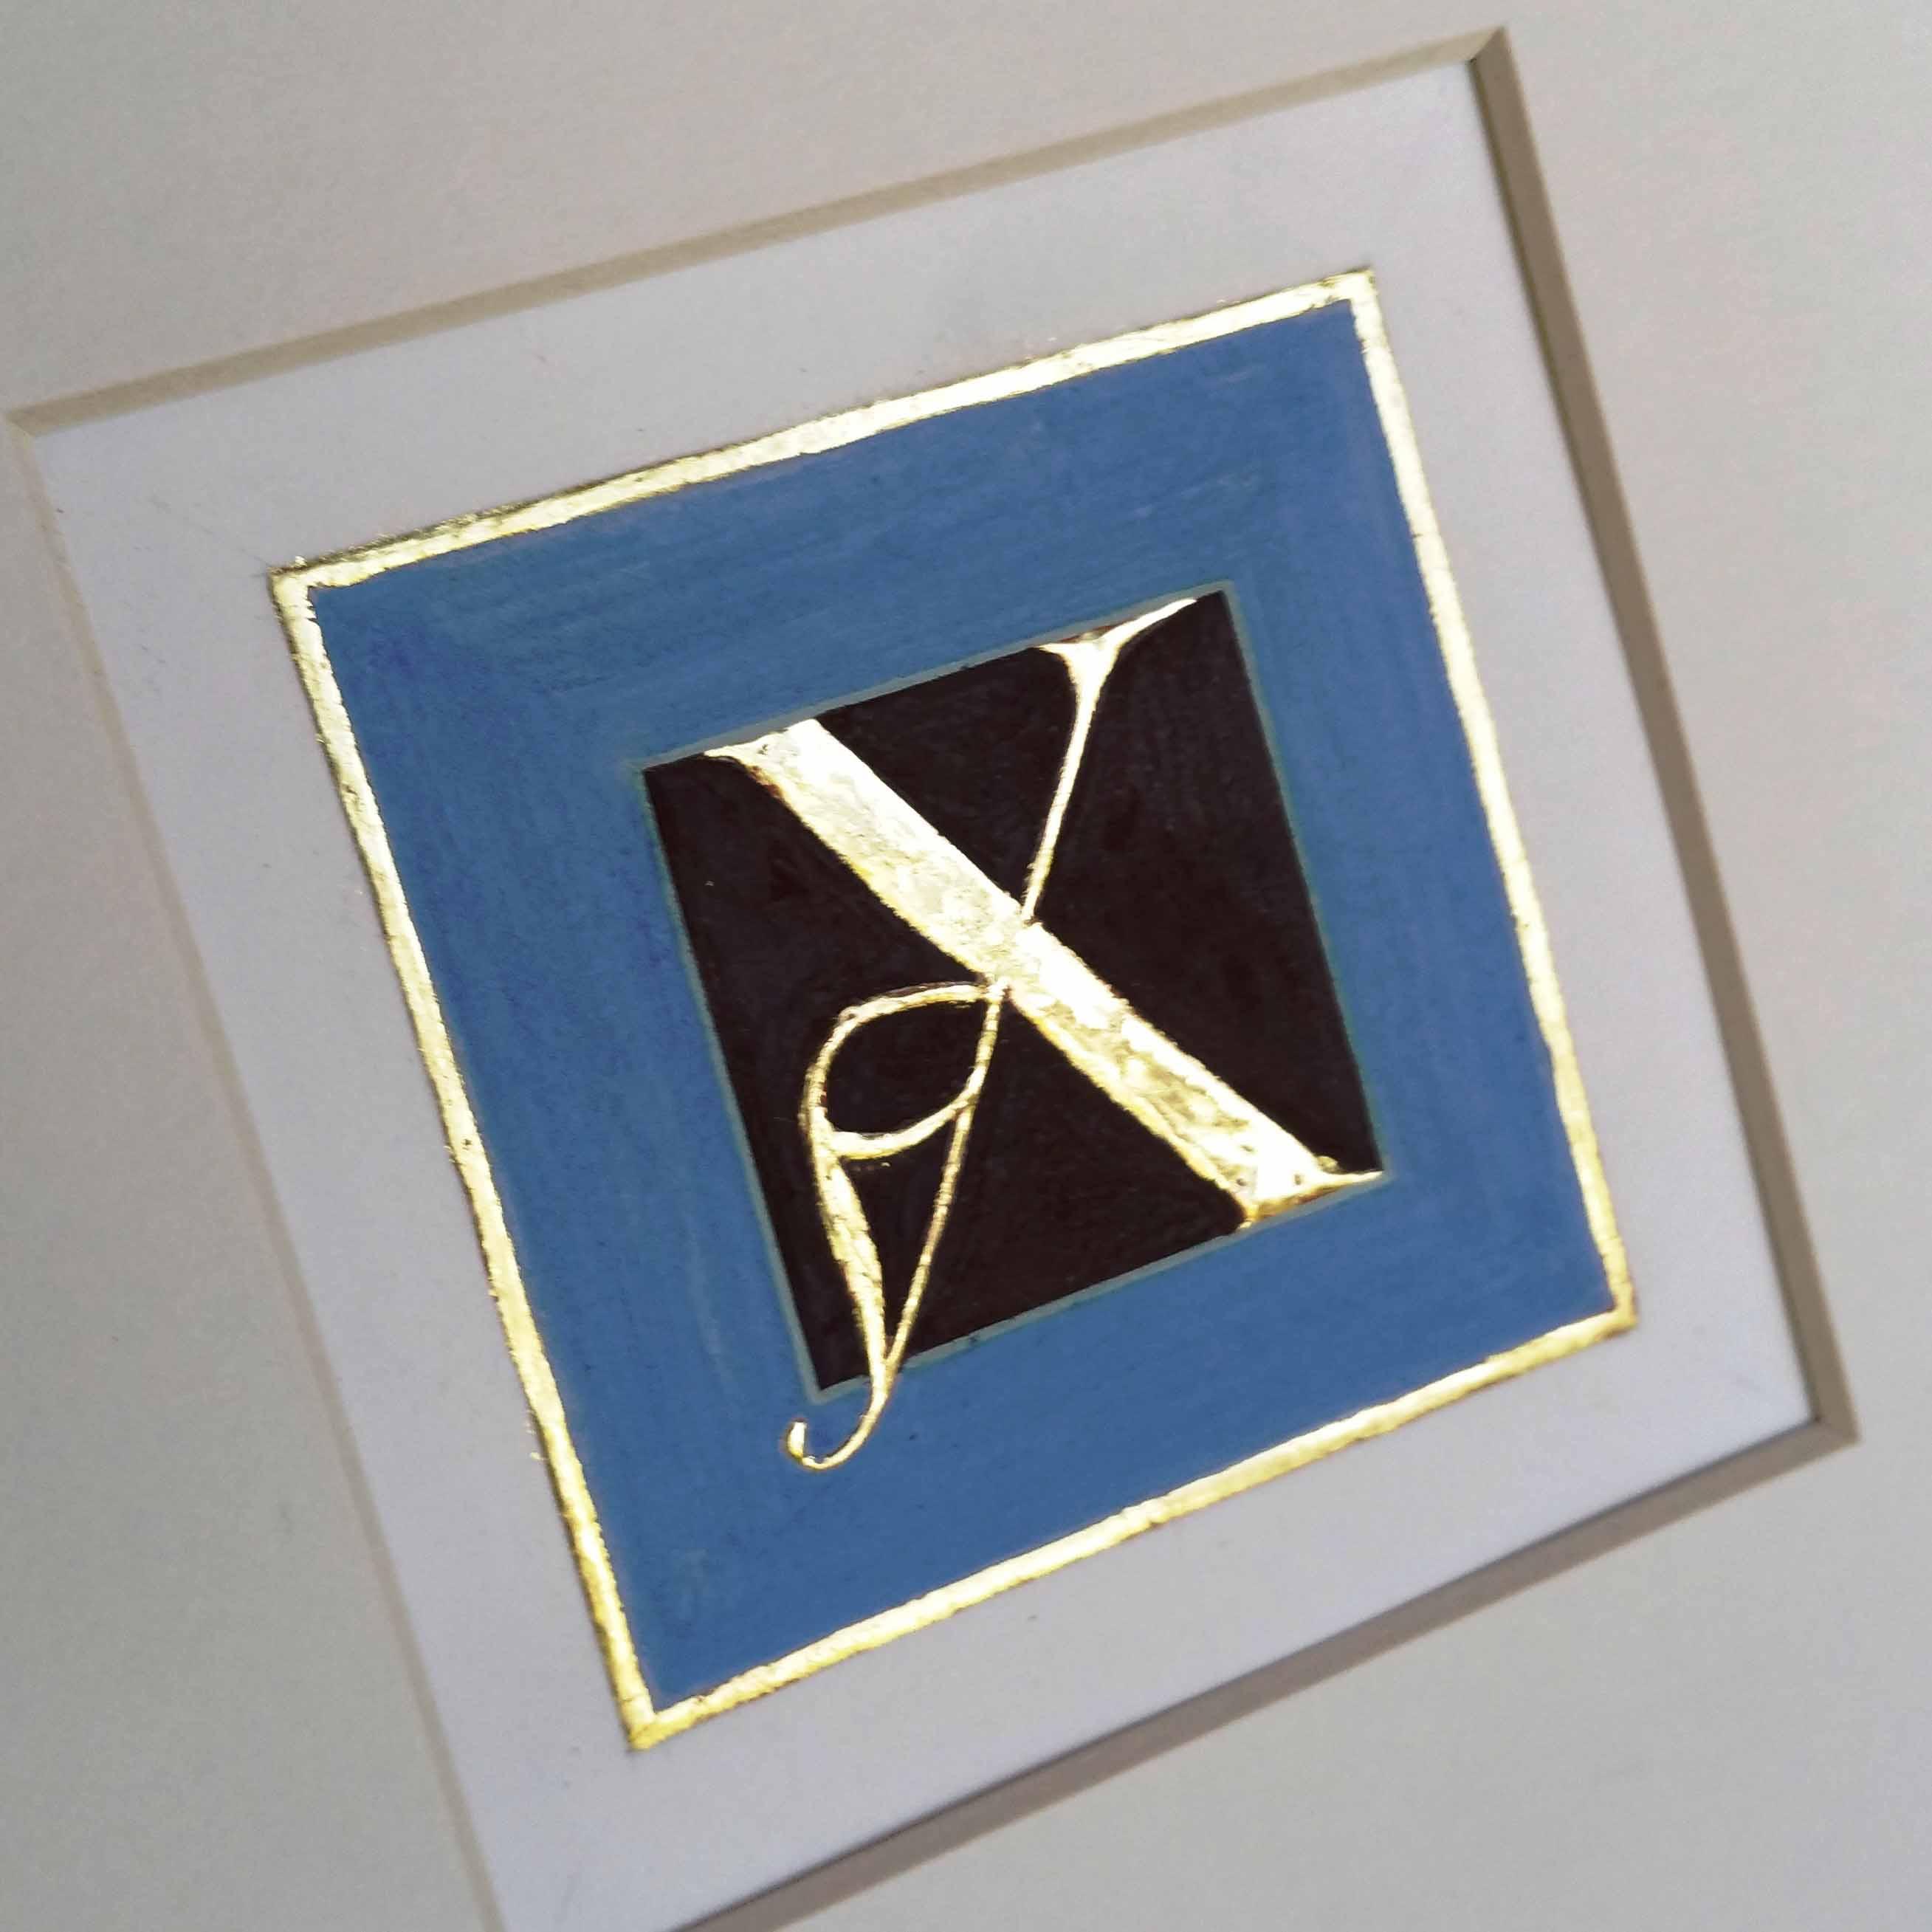 Gilded letter X